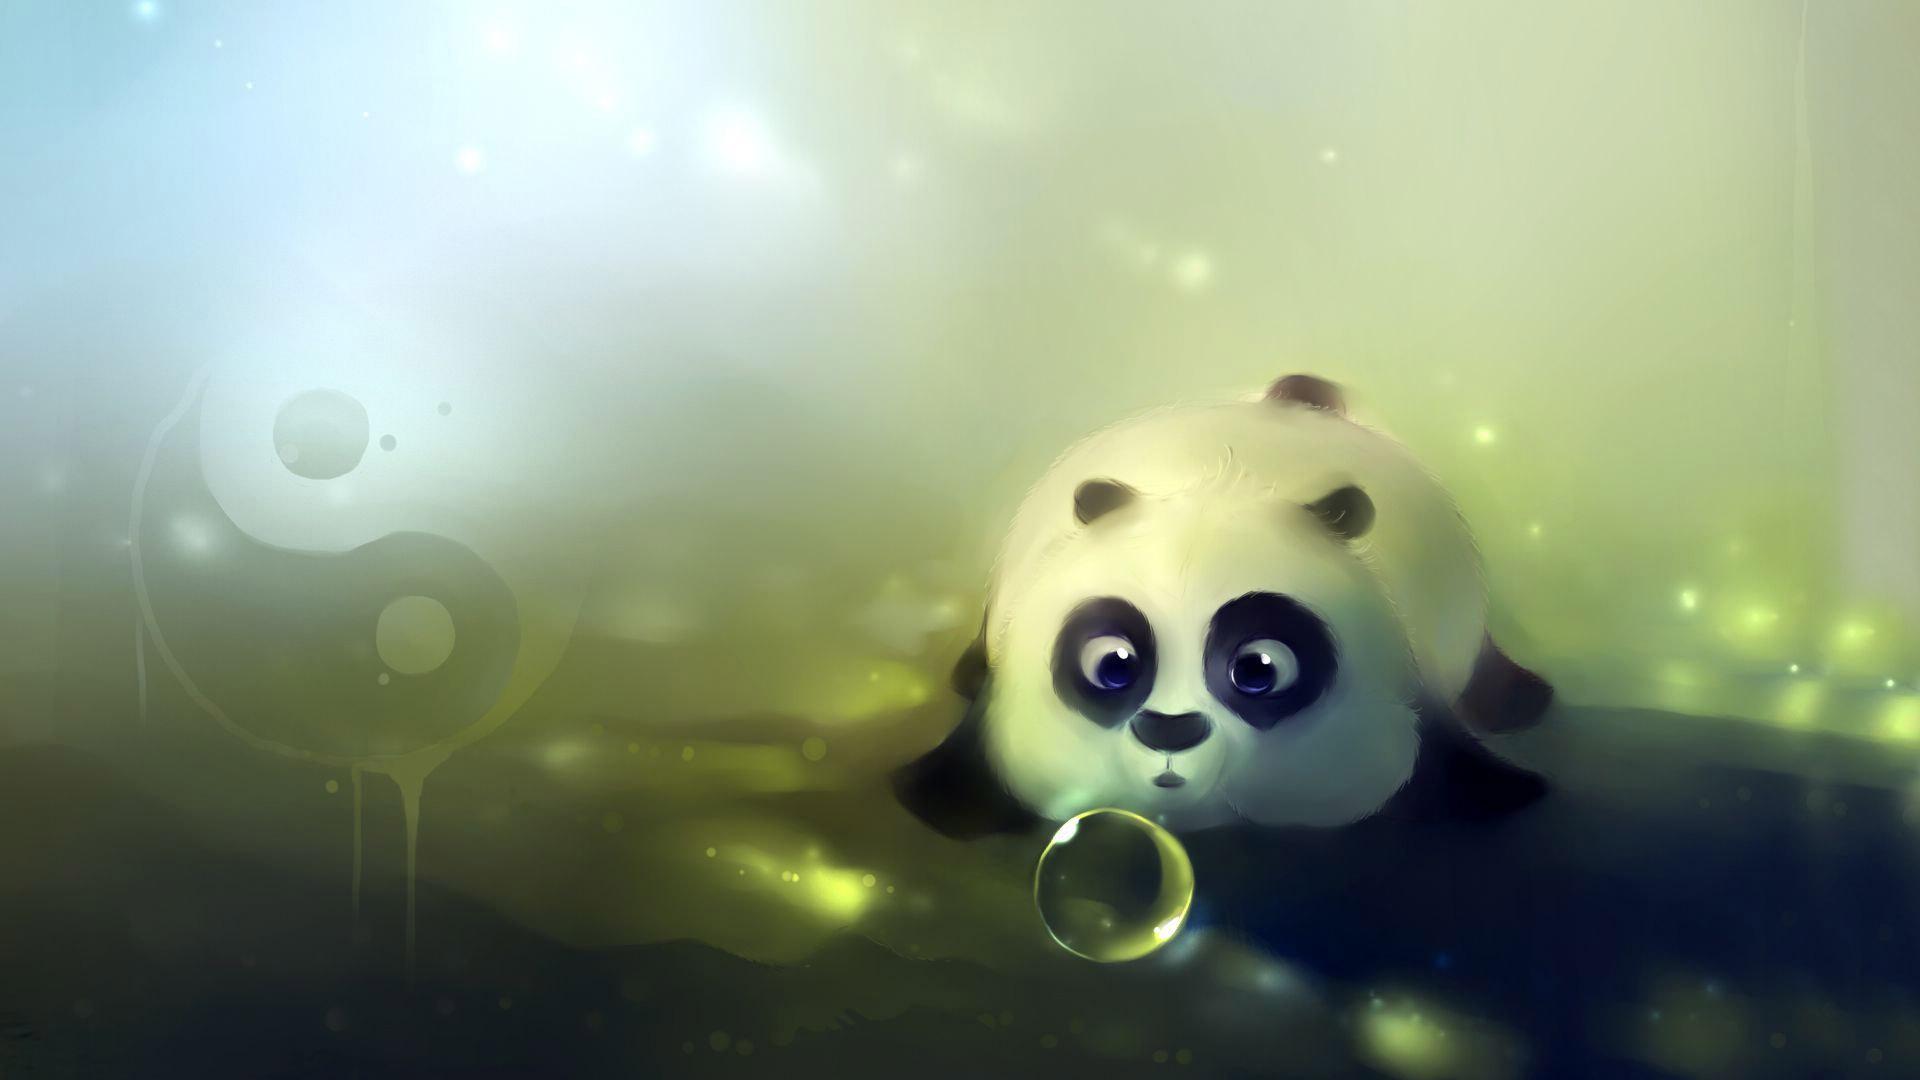 Res: 1920x1080, Anime Panda Wallpaper 07556